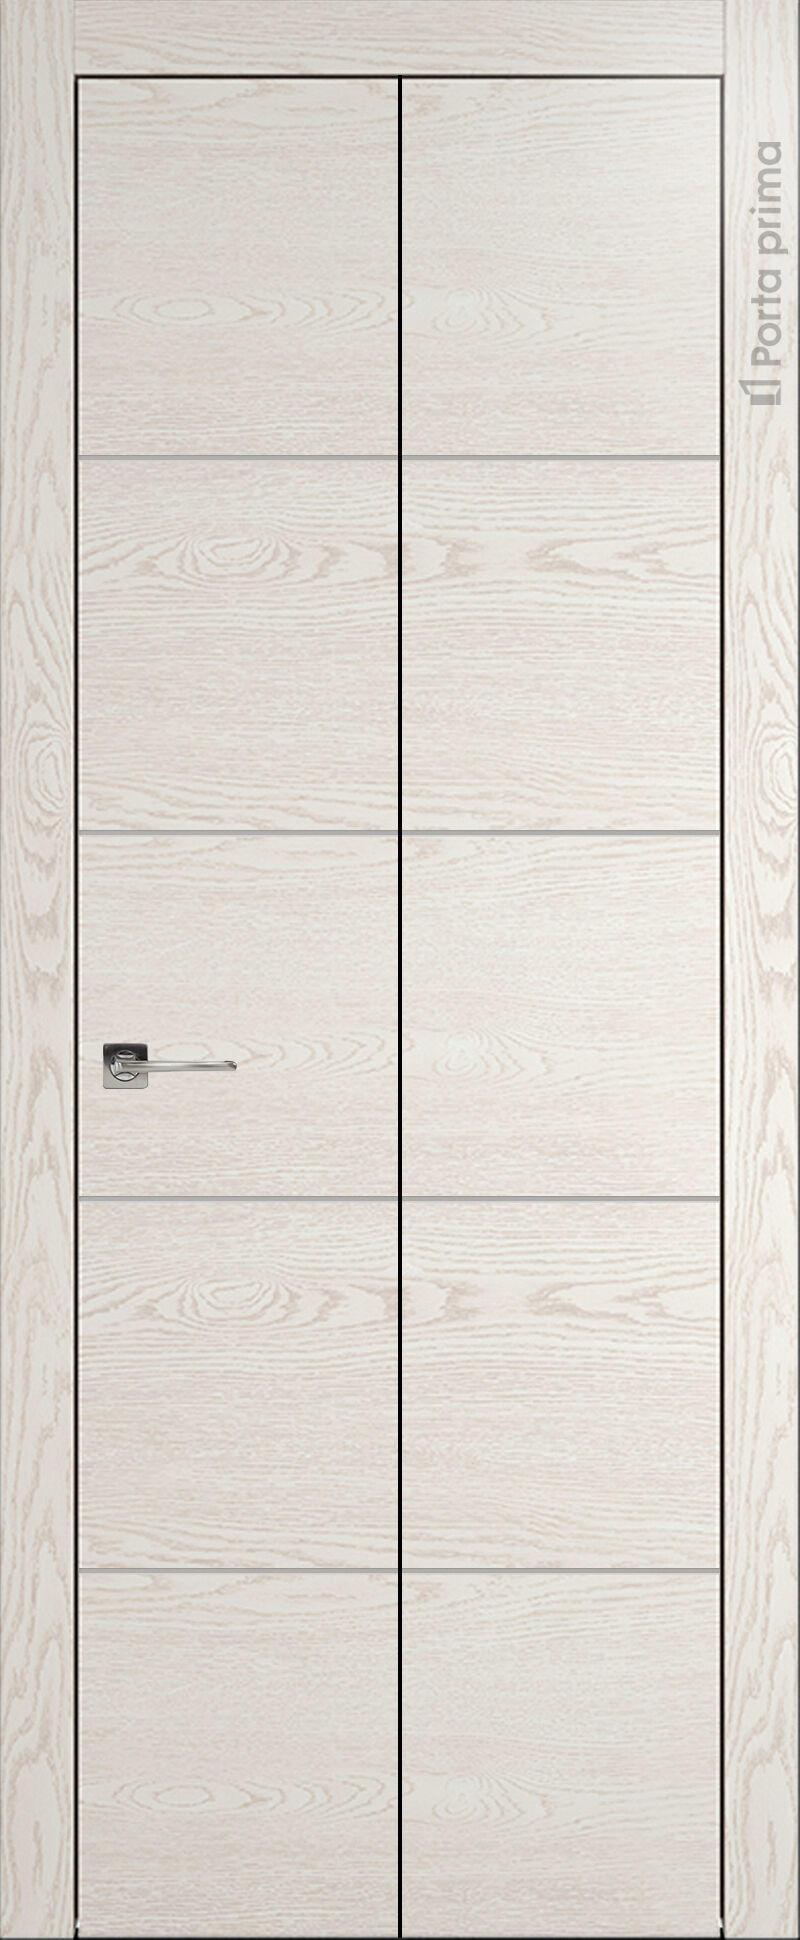 Tivoli Д-2 Книжка цвет - Белый ясень Без стекла (ДГ)